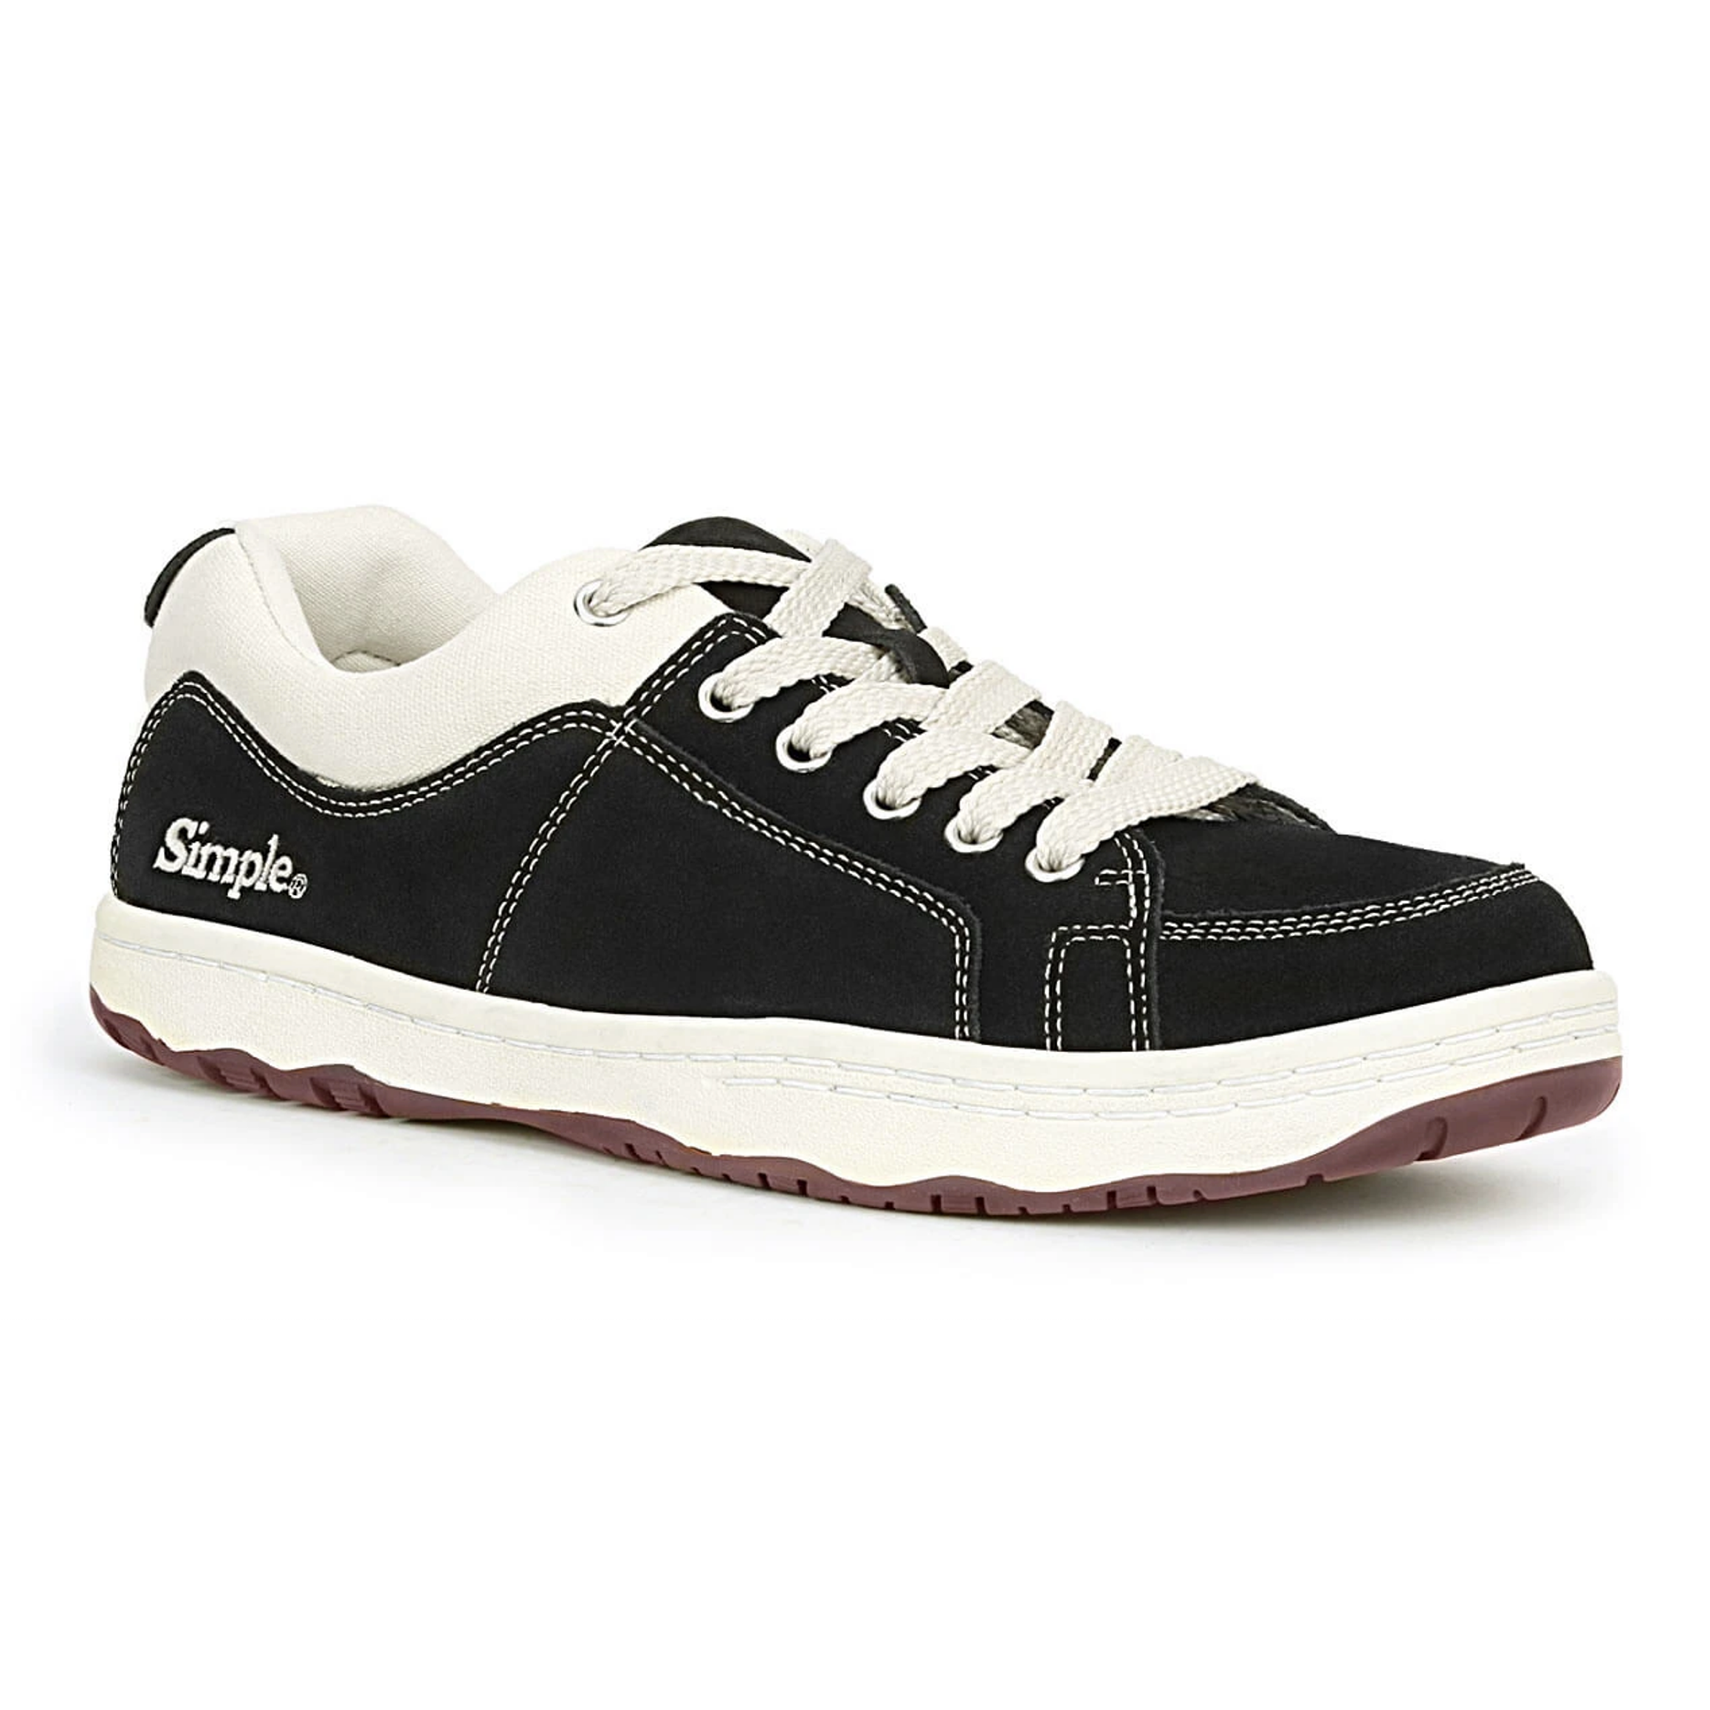 OS Sneaker, Suede, Black-1